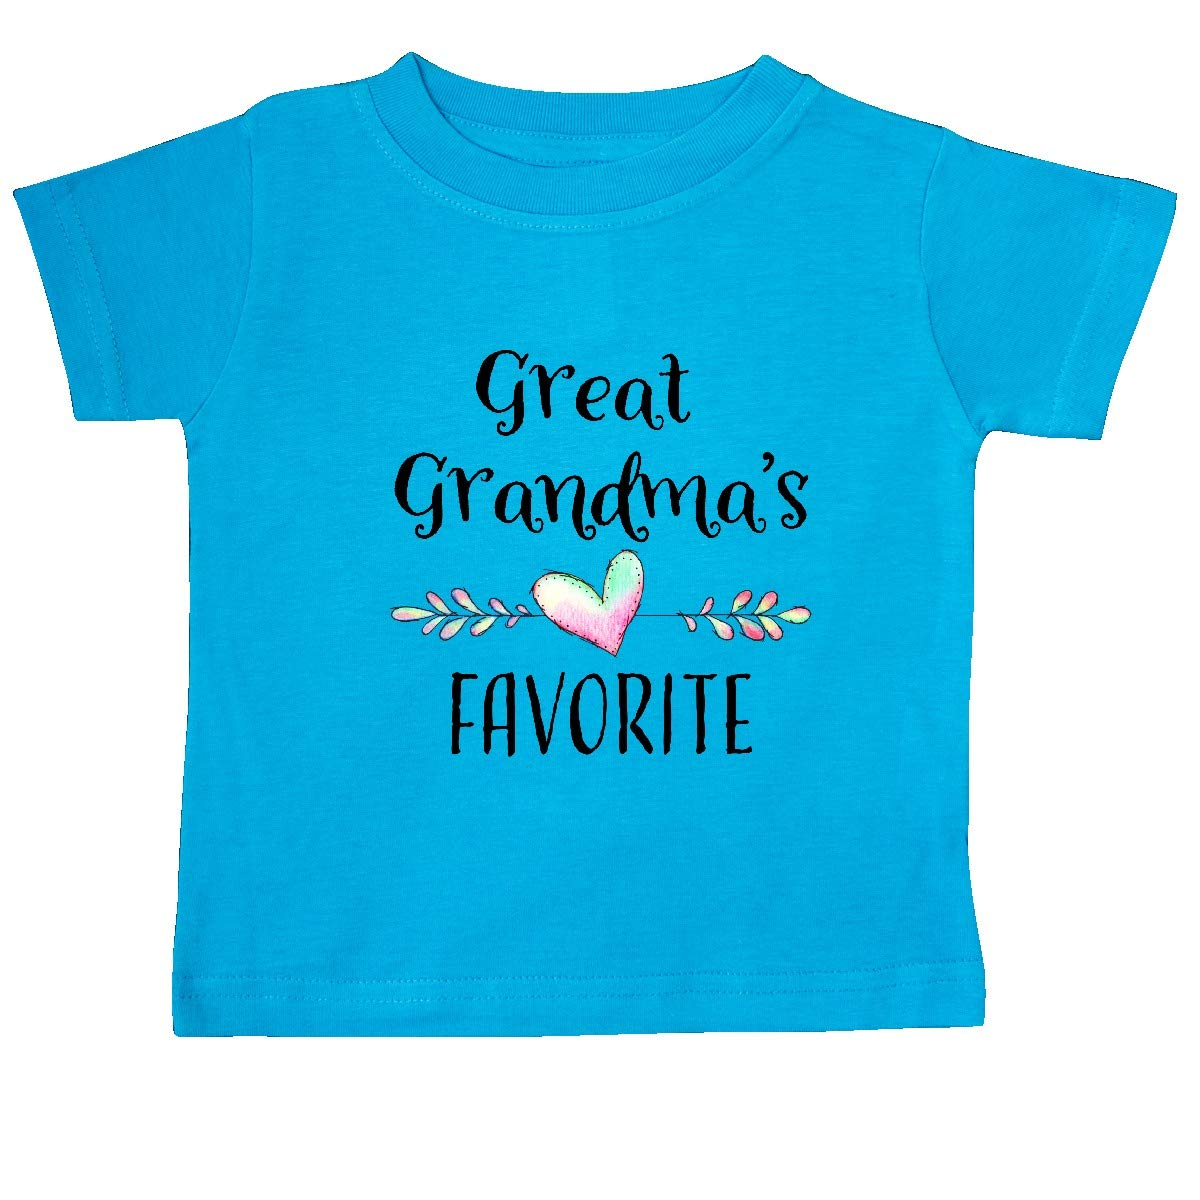 Heart Great Grandchild Baby T-Shirt inktastic Great Grandmas Favorite